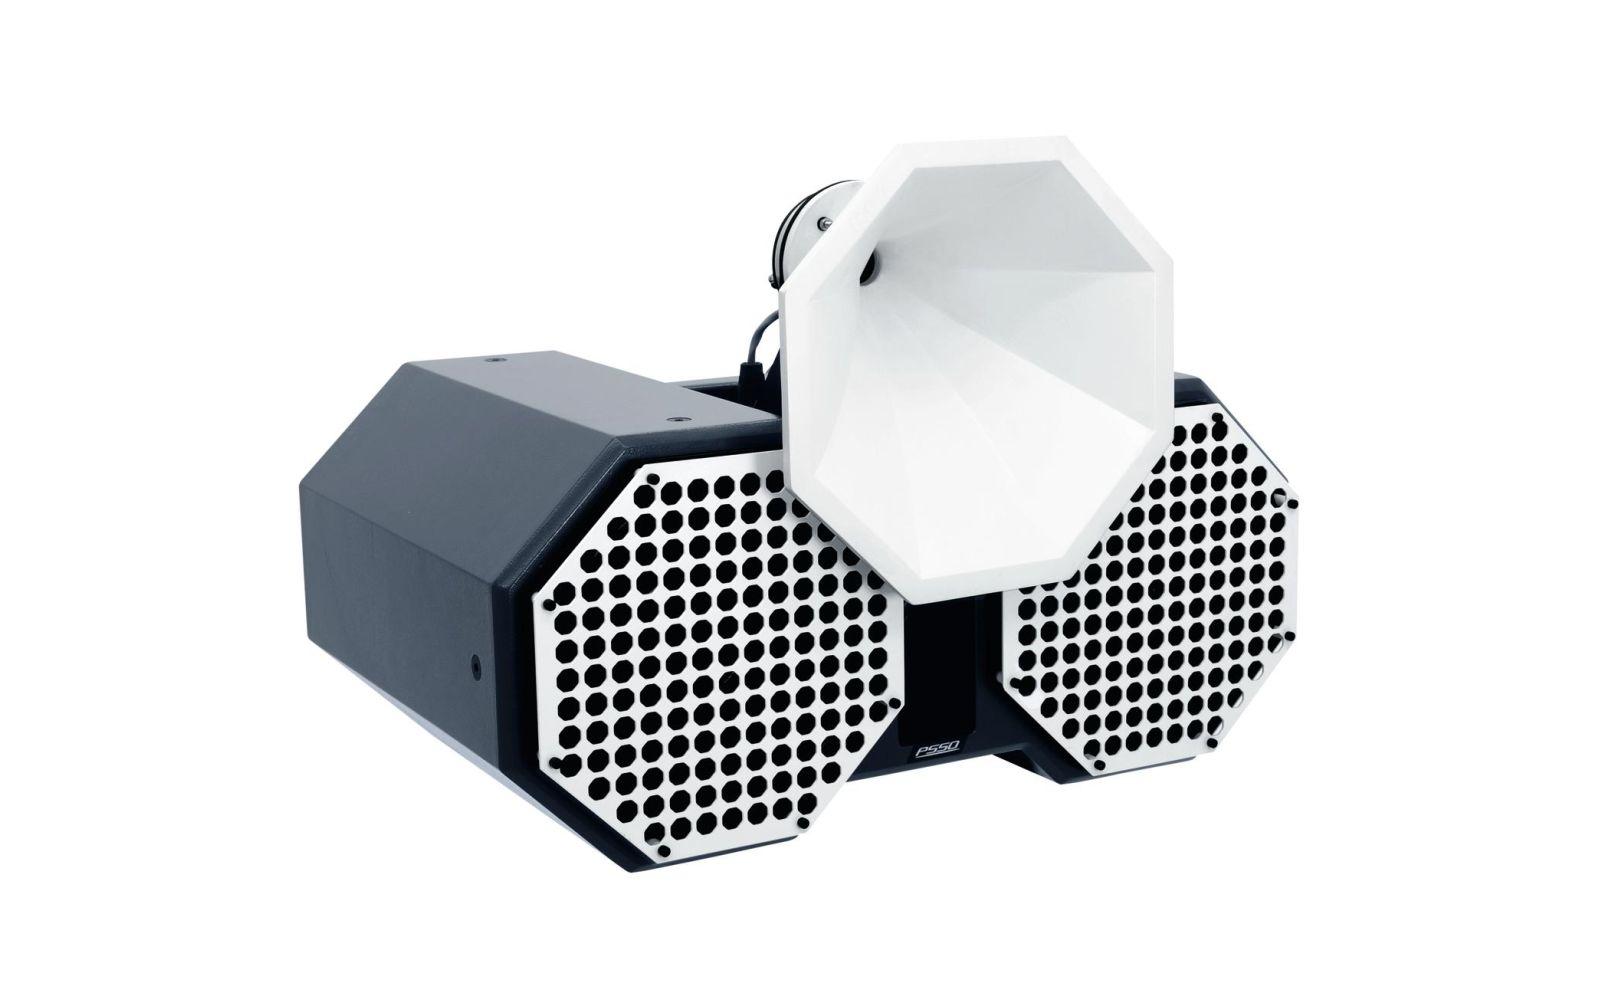 psso-prime-212-club-lautsprechersystem